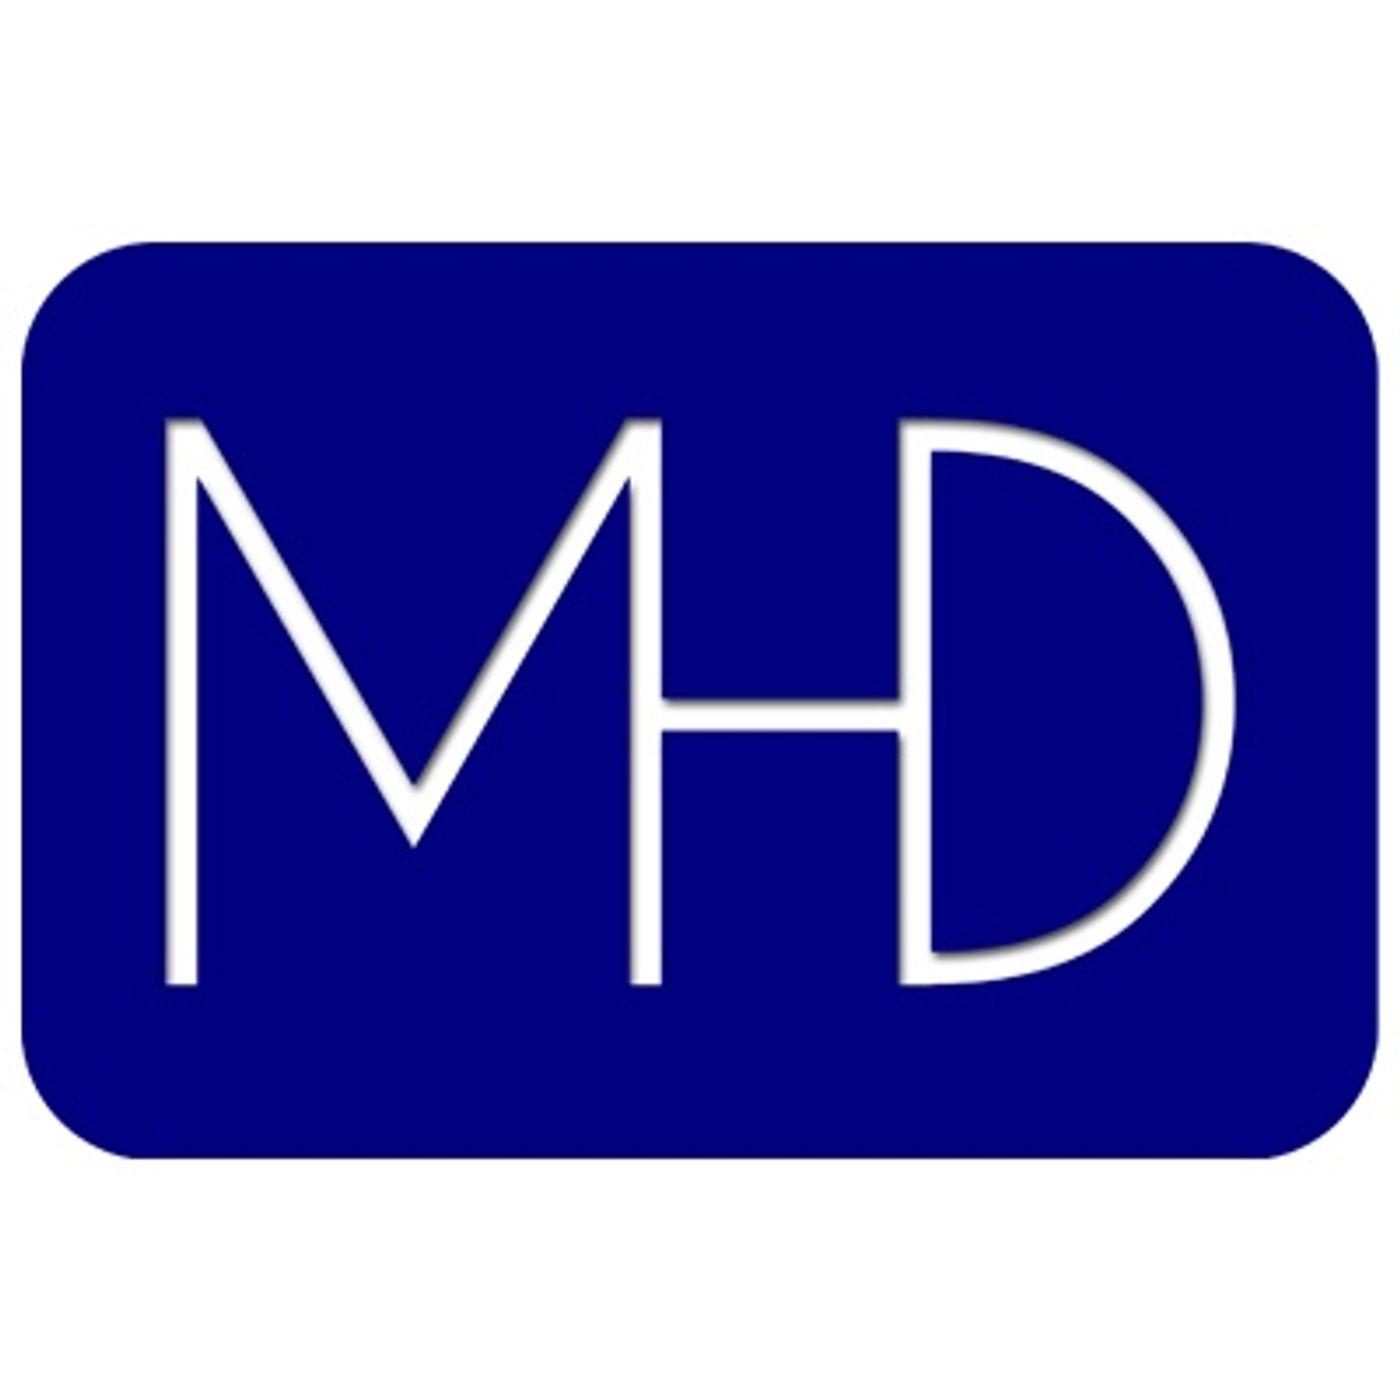 MHD di Frank Julian del 03.11.2020